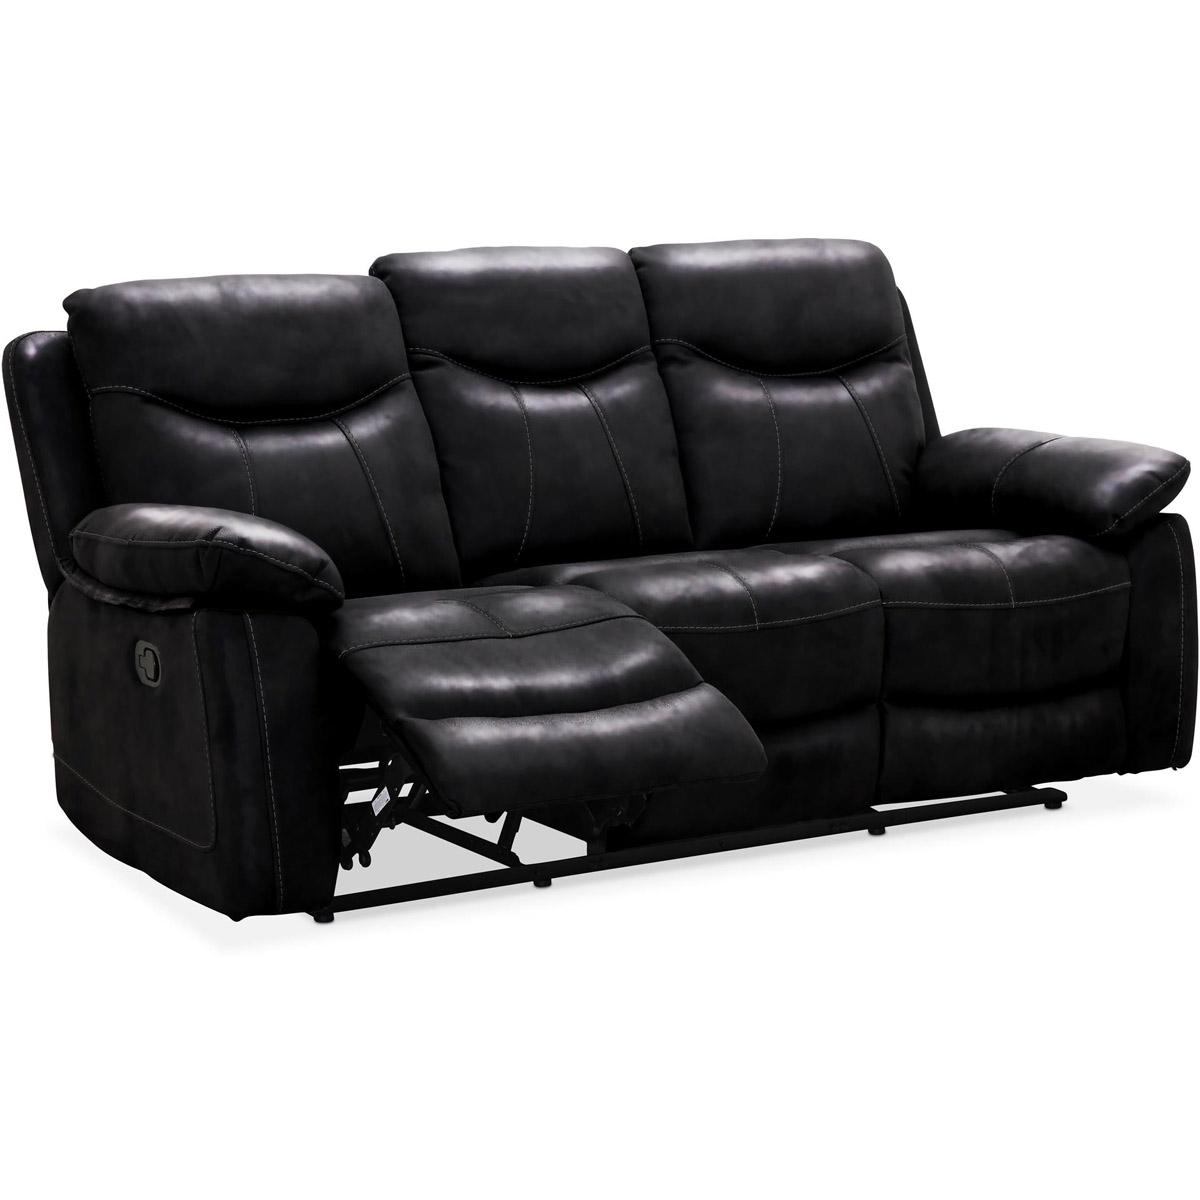 Boston 3-sitssoffa recliner läder svart